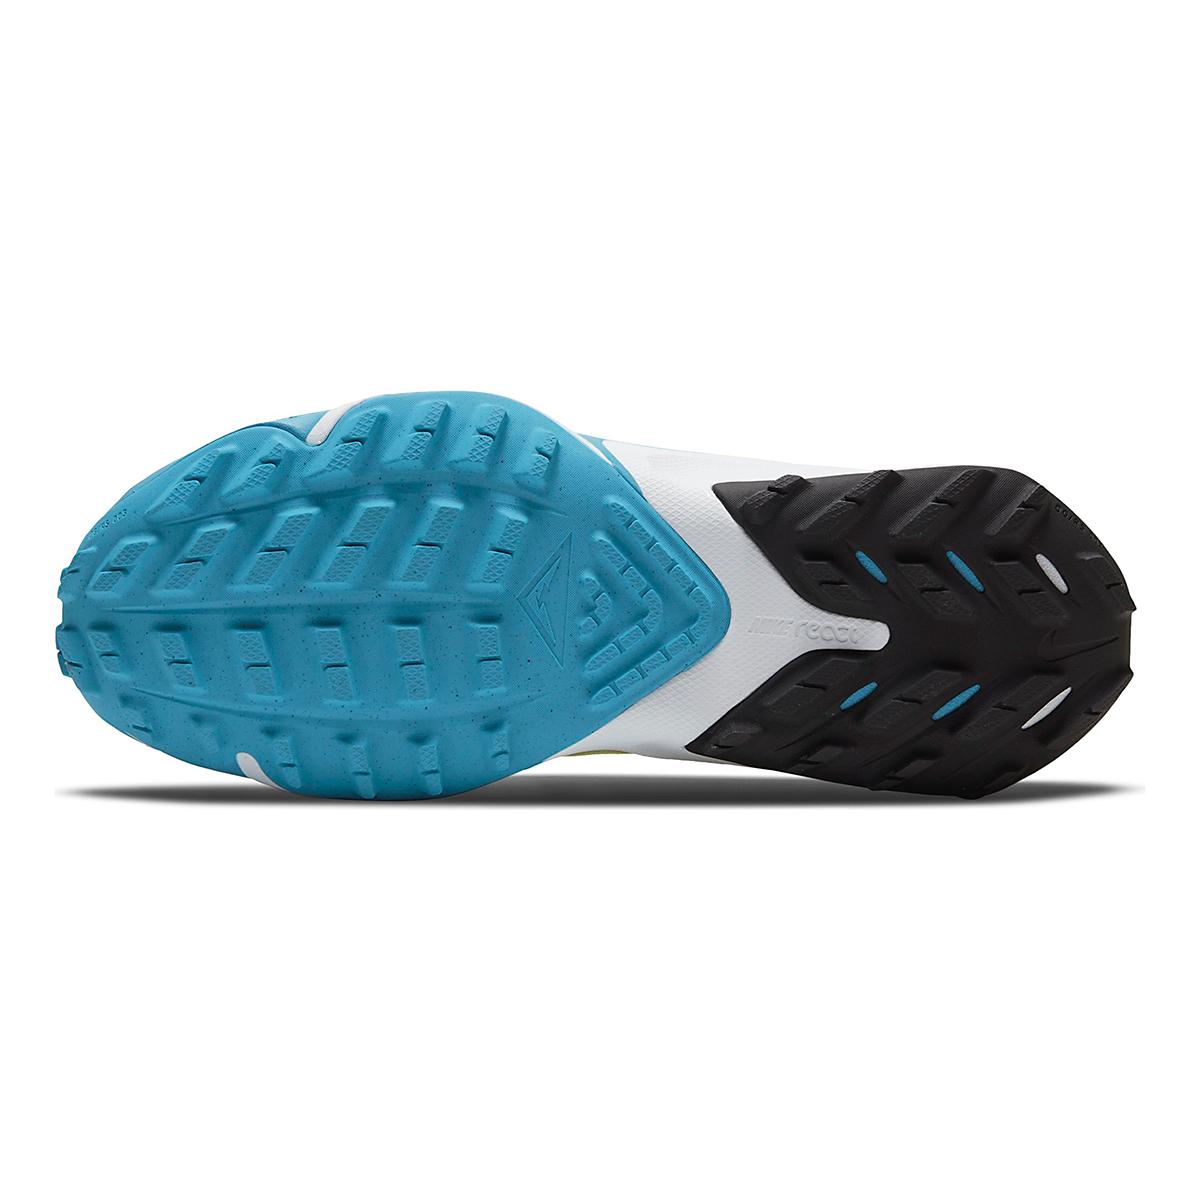 Women's Nike Air Zoom Terra Kiger 7 Trail Running Shoe - Color: Limelight/Off Noir/Laser Blue - Size: 5 - Width: Regular, Limelight/Off Noir/Laser Blue, large, image 6